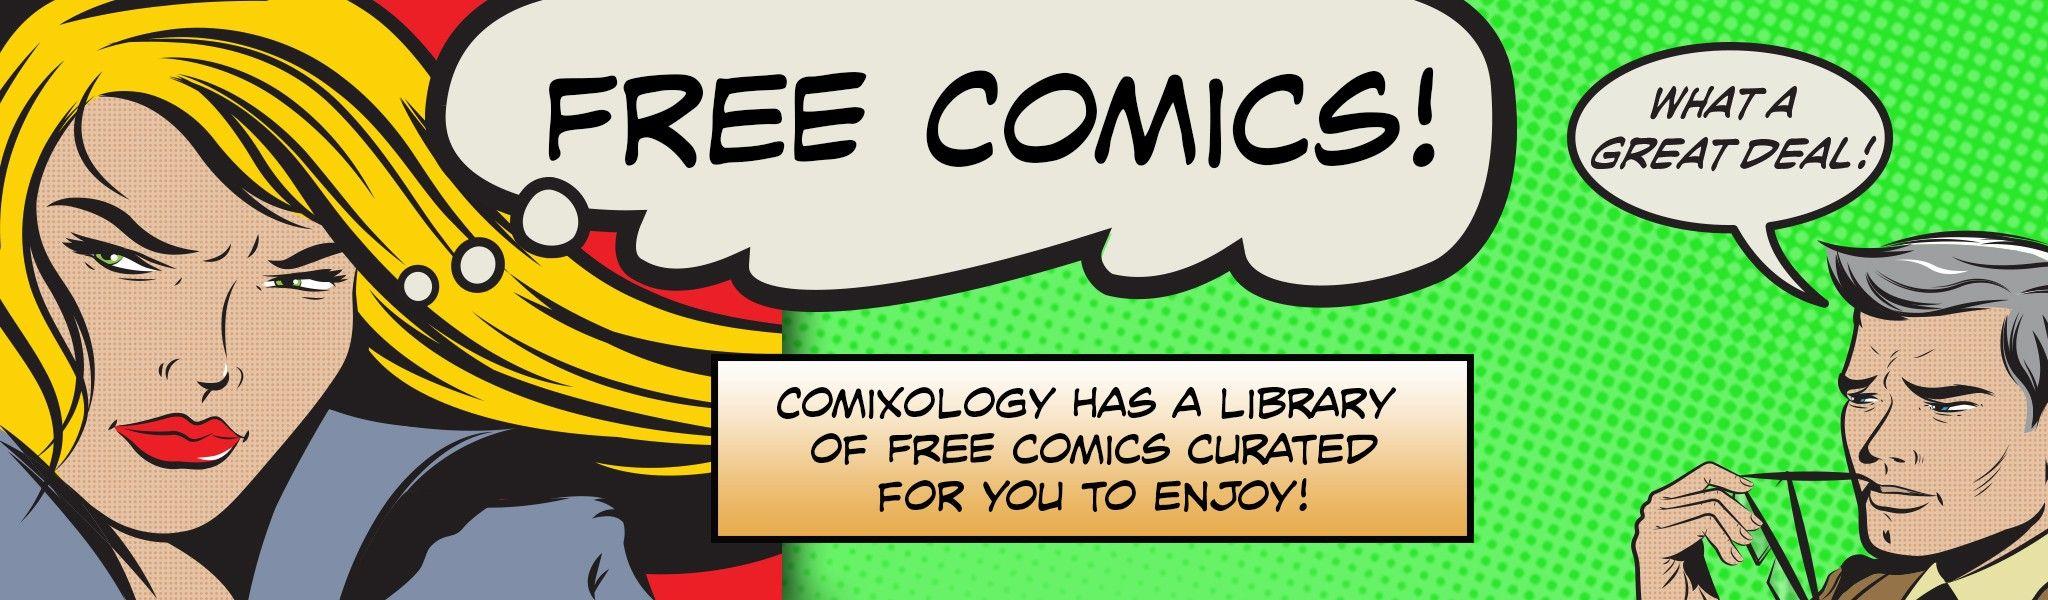 123 Comics Gratis